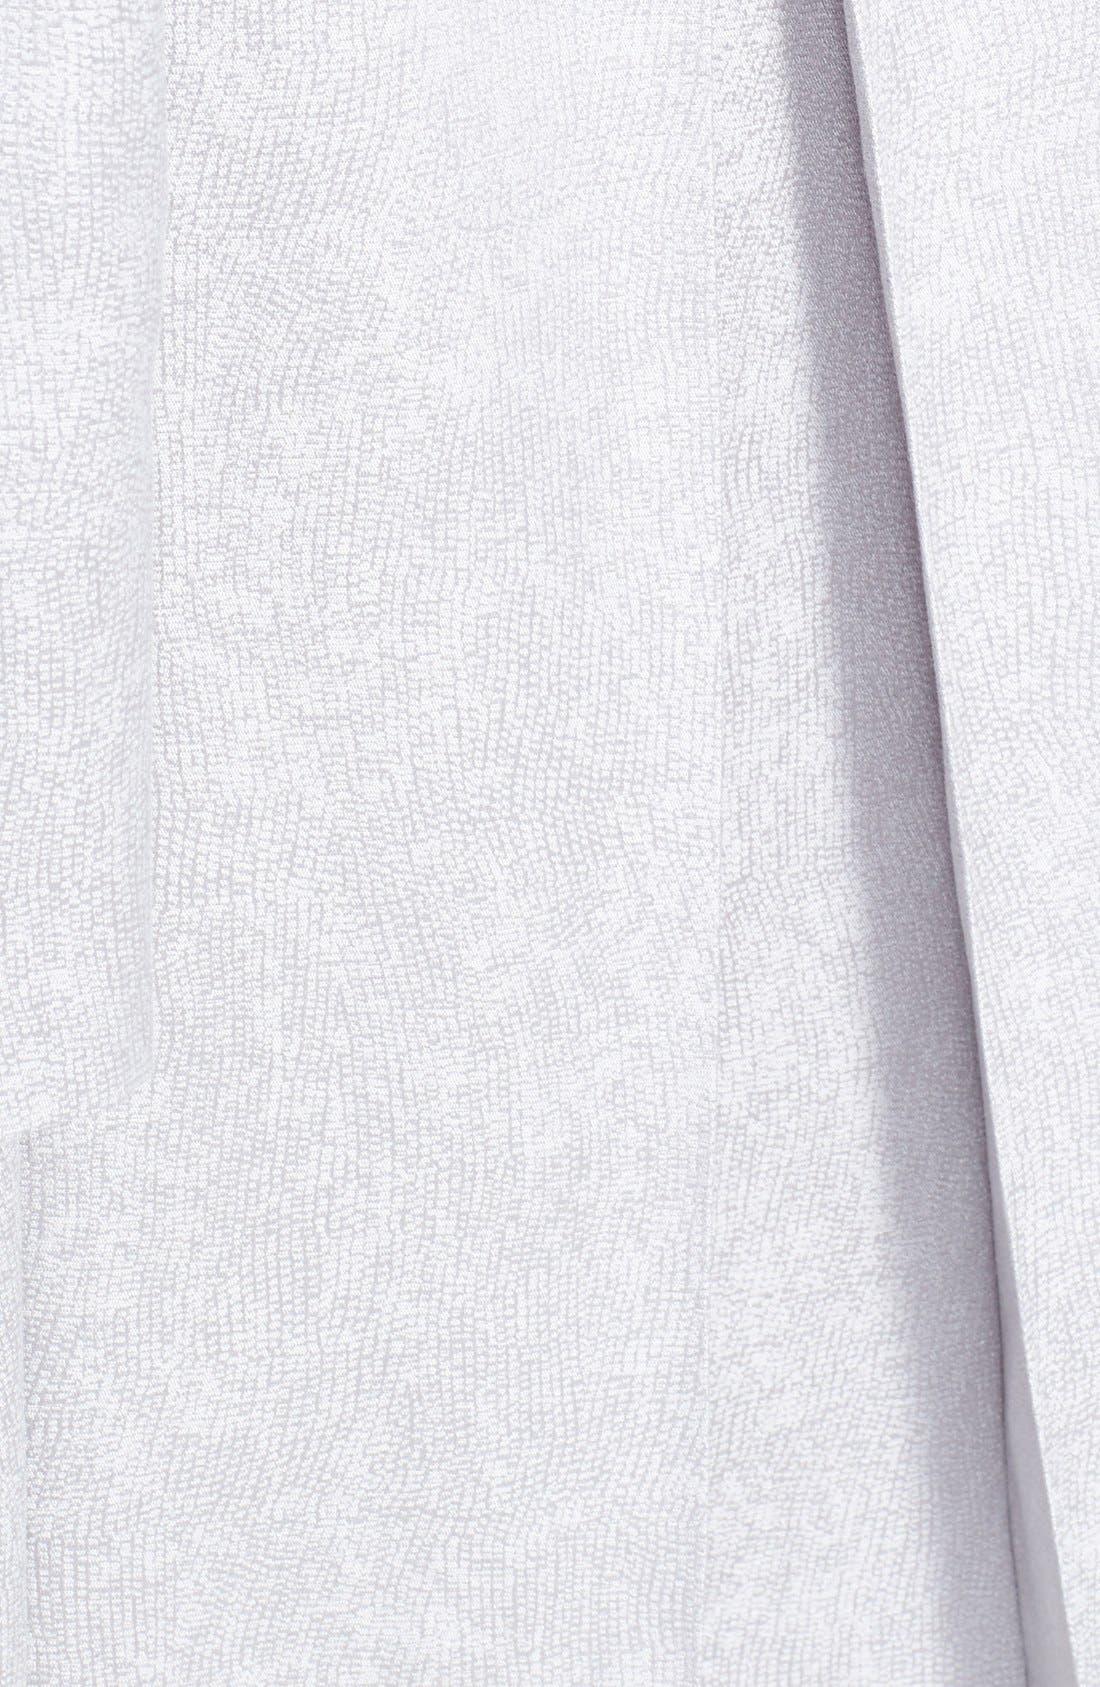 Alternate Image 3  - Eileen Fisher Jacquard Coat (Plus Size)